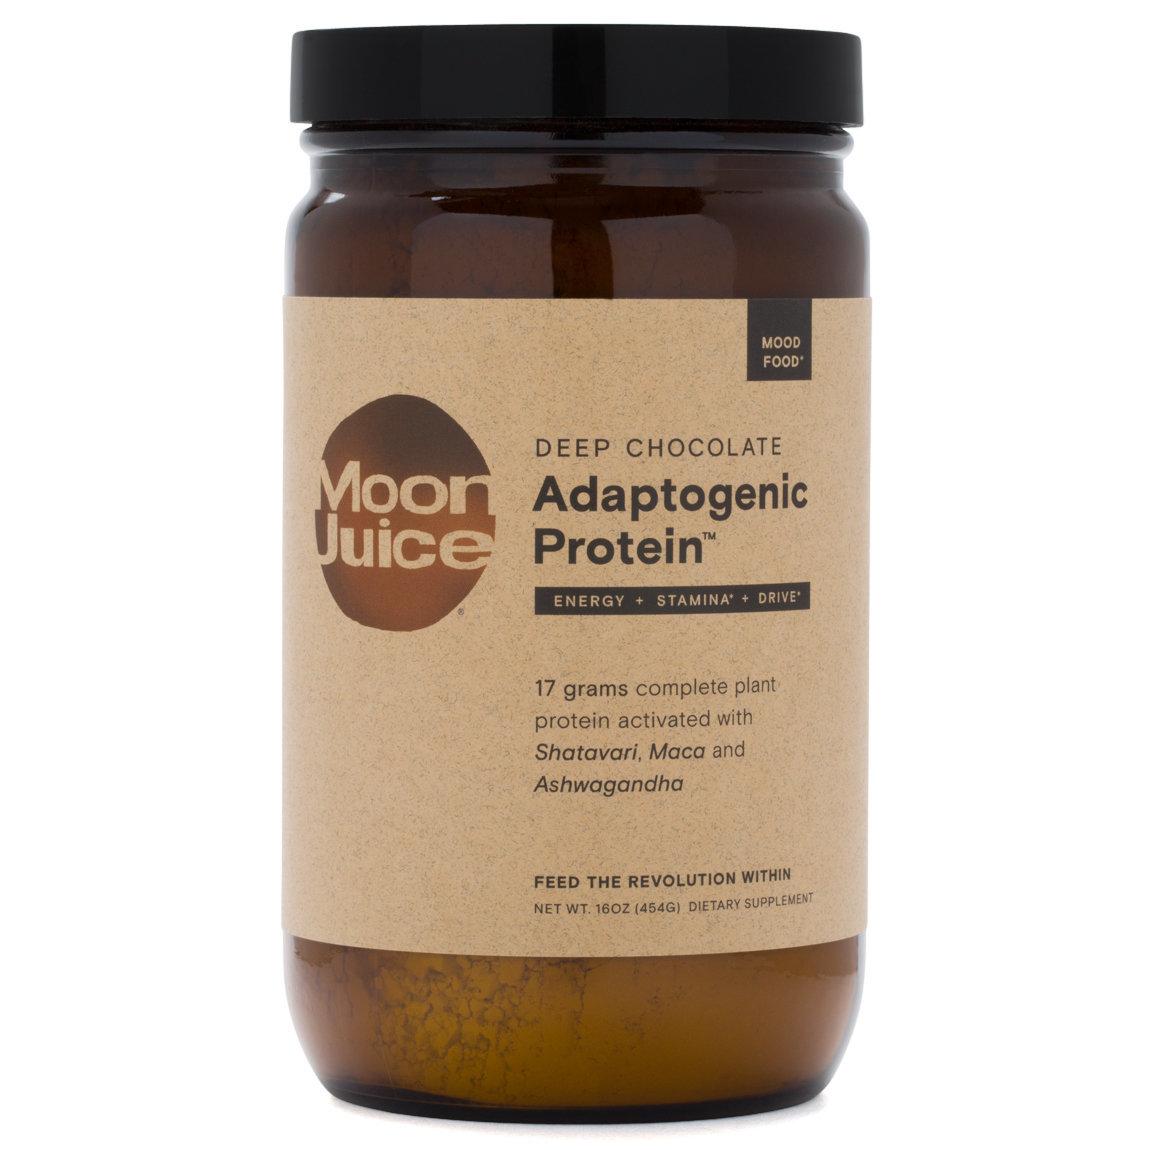 Moon Juice Deep Chocolate Adaptogenic Protein alternative view 1 - product swatch.